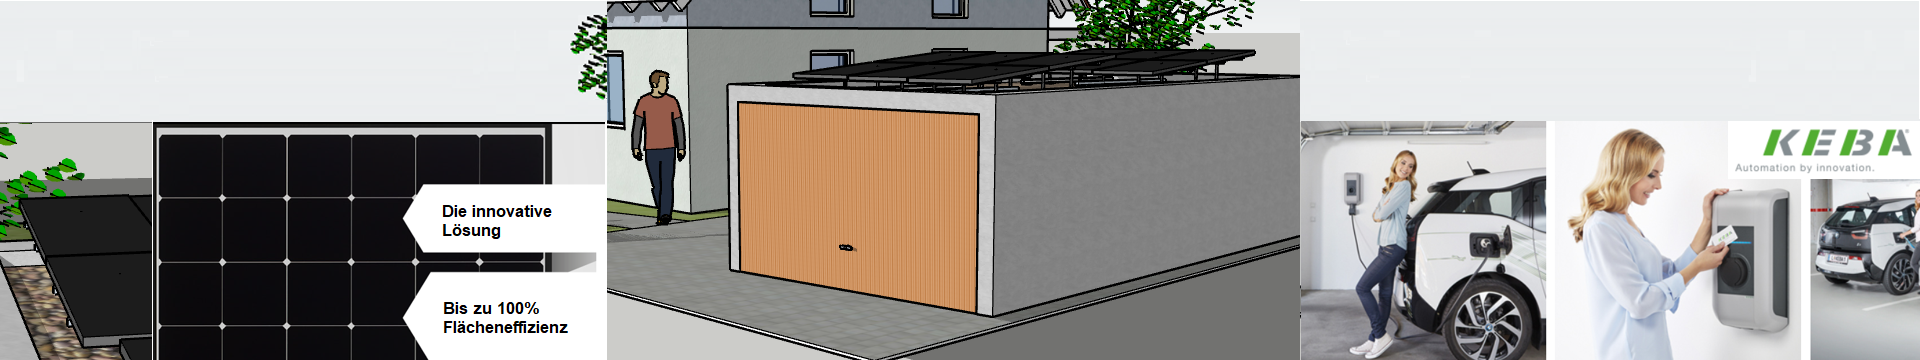 Garage mit Flachdach & KEBA Wallbox